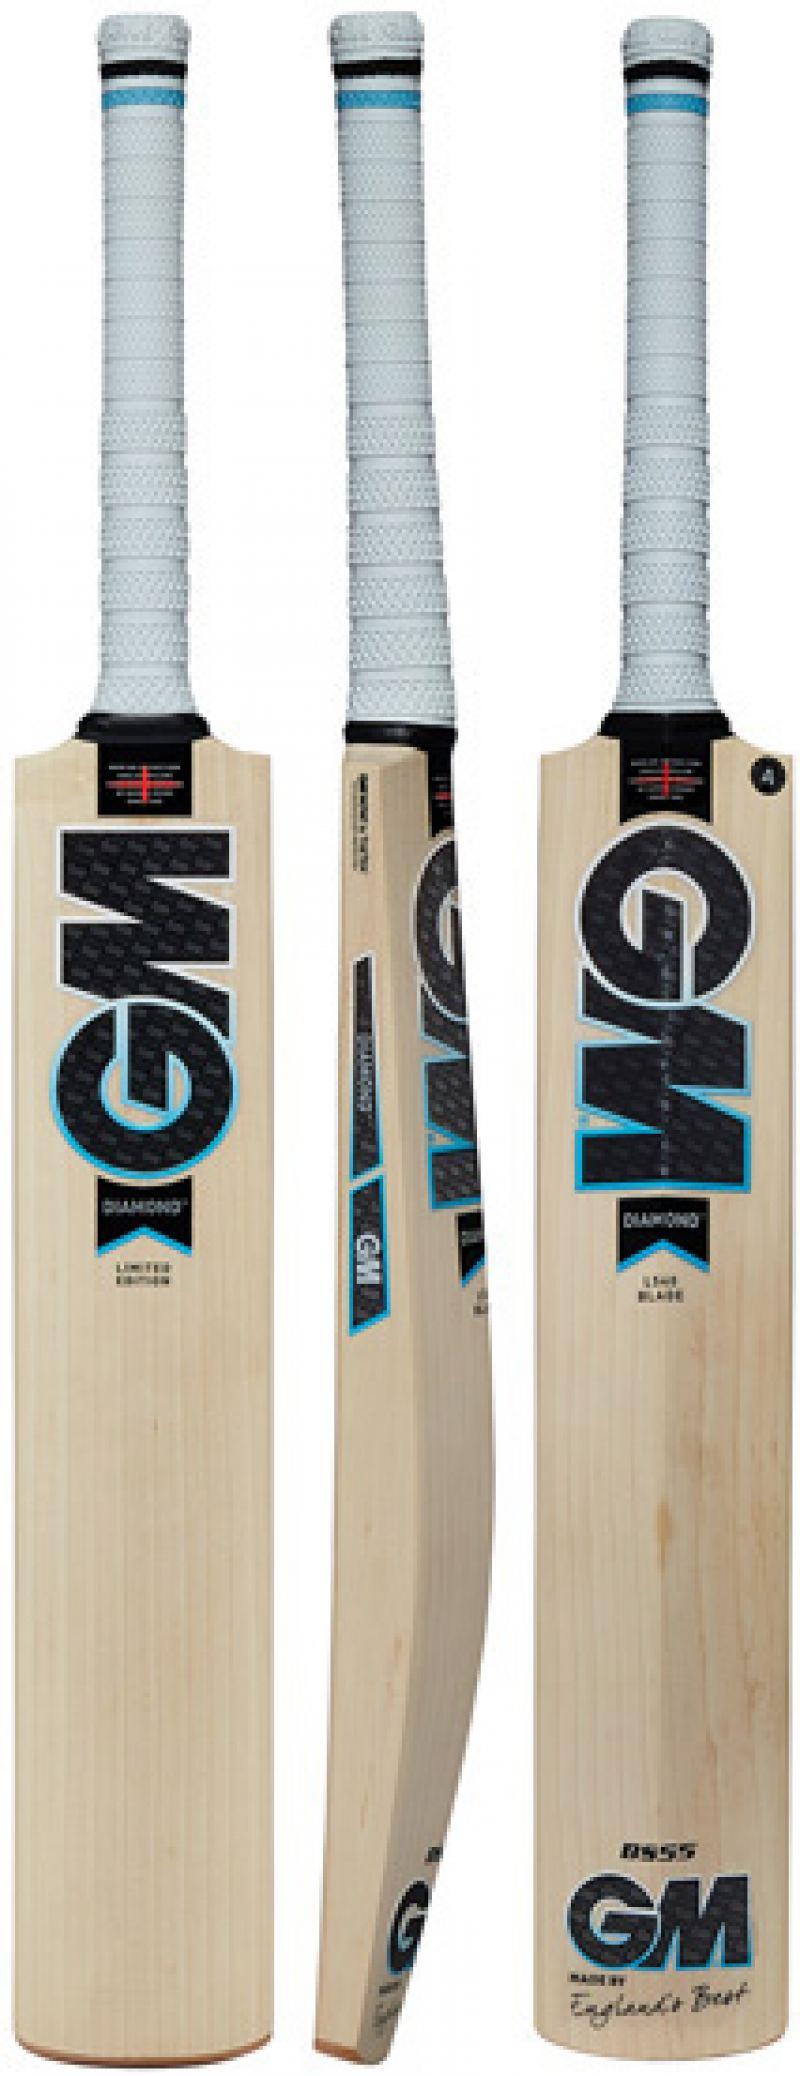 Gunn and Moore Diamond DXM 808 Junior Cricket Bat